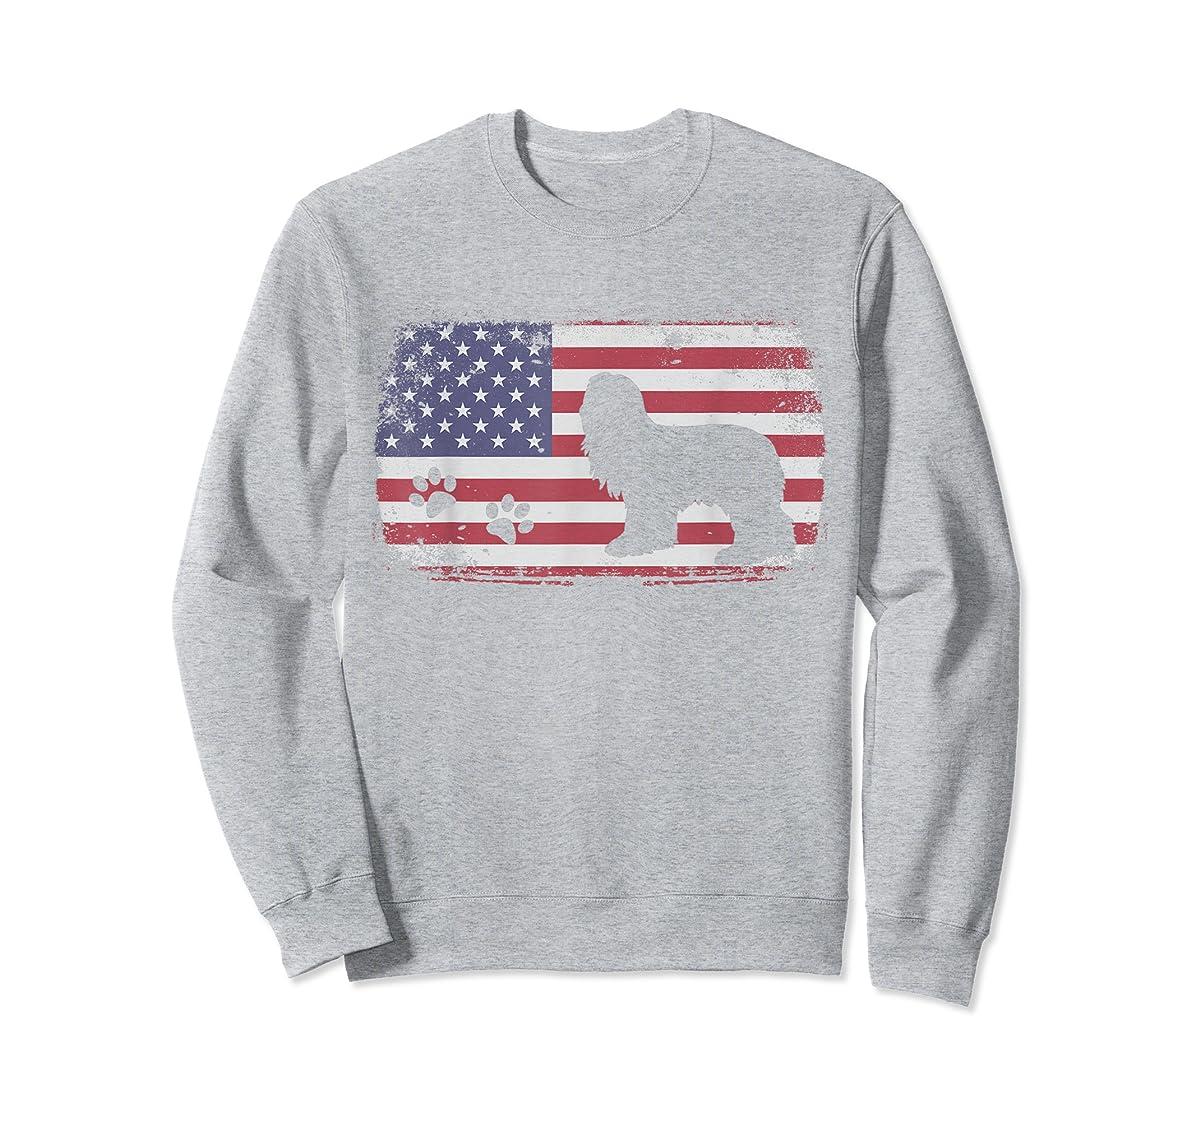 Vintage American Flag Bearded Collie Dog T-Shirt-Sweatshirt-Sport Grey